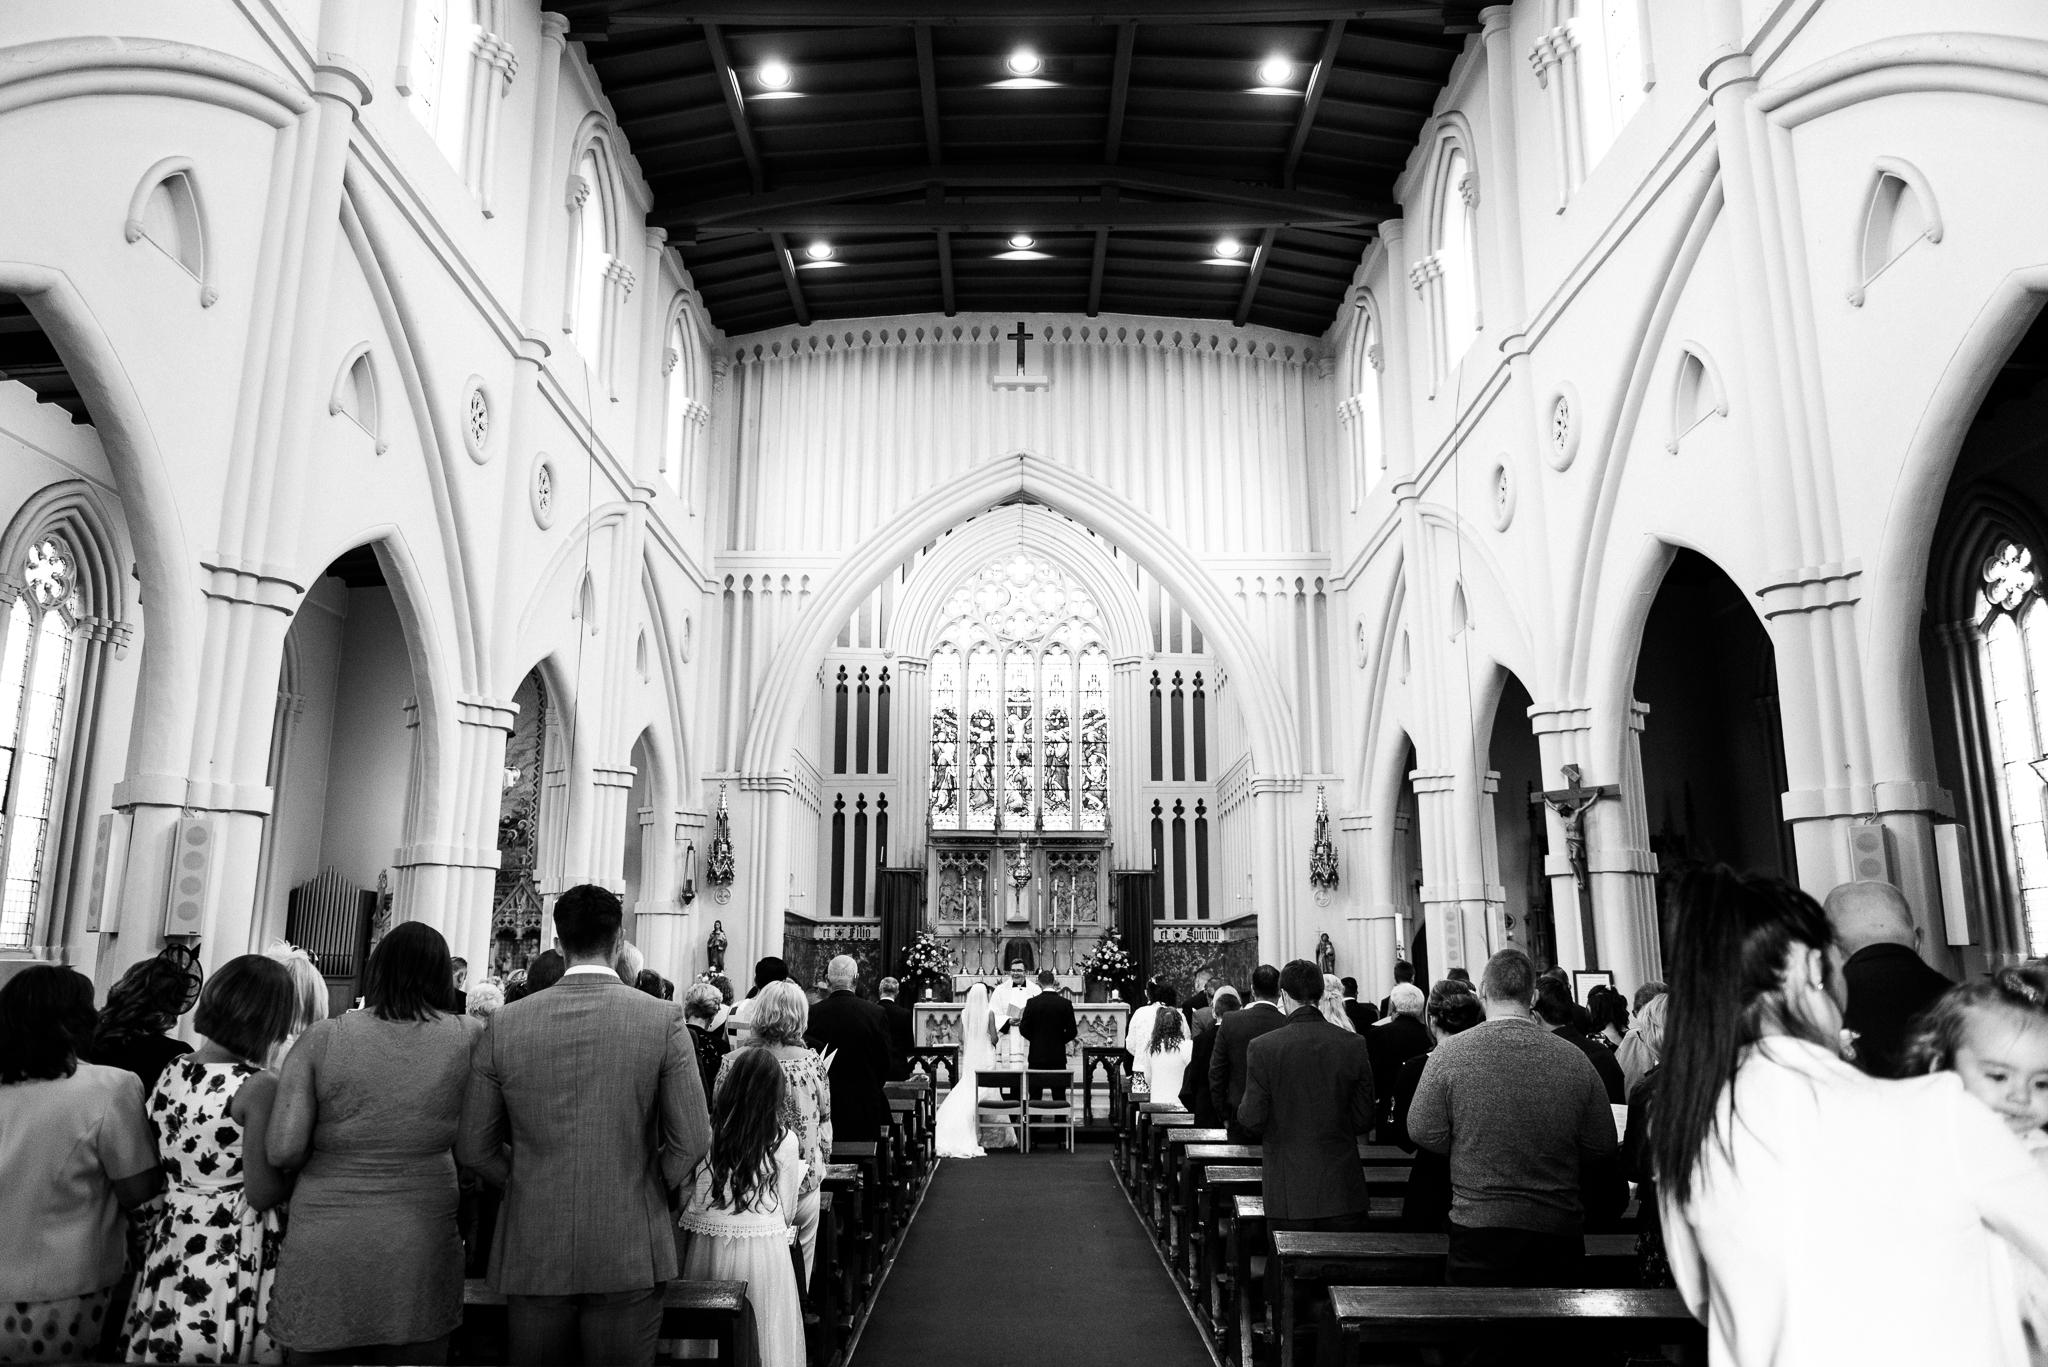 Staffordshire Wedding Catholic Newcastle-under-Lyme Floral Hall Tunstall Documentary Photography - Jenny Harper-20.jpg